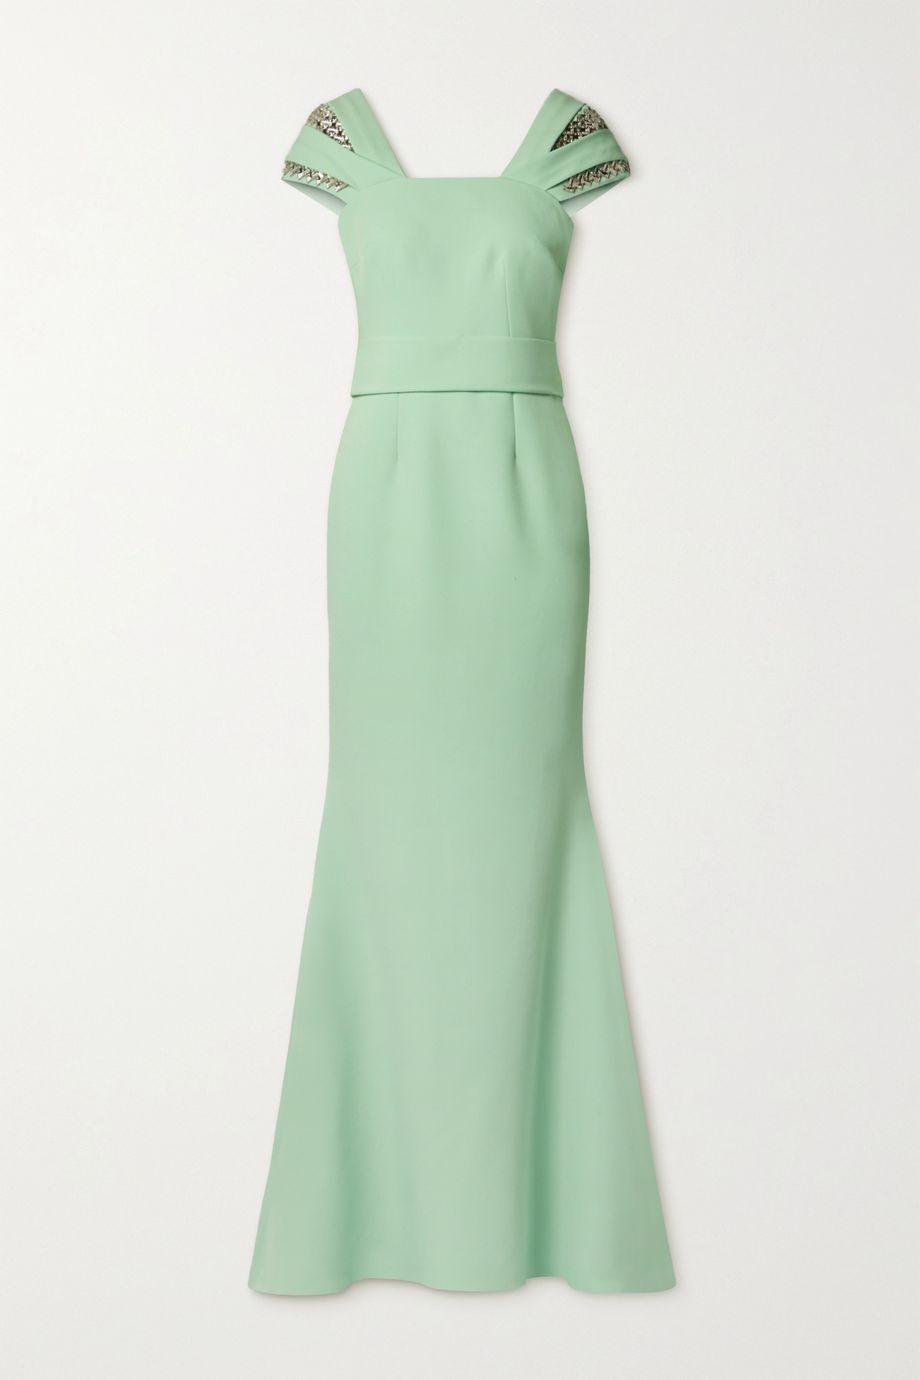 Safiyaa Abigail crystal-embellished crepe gown